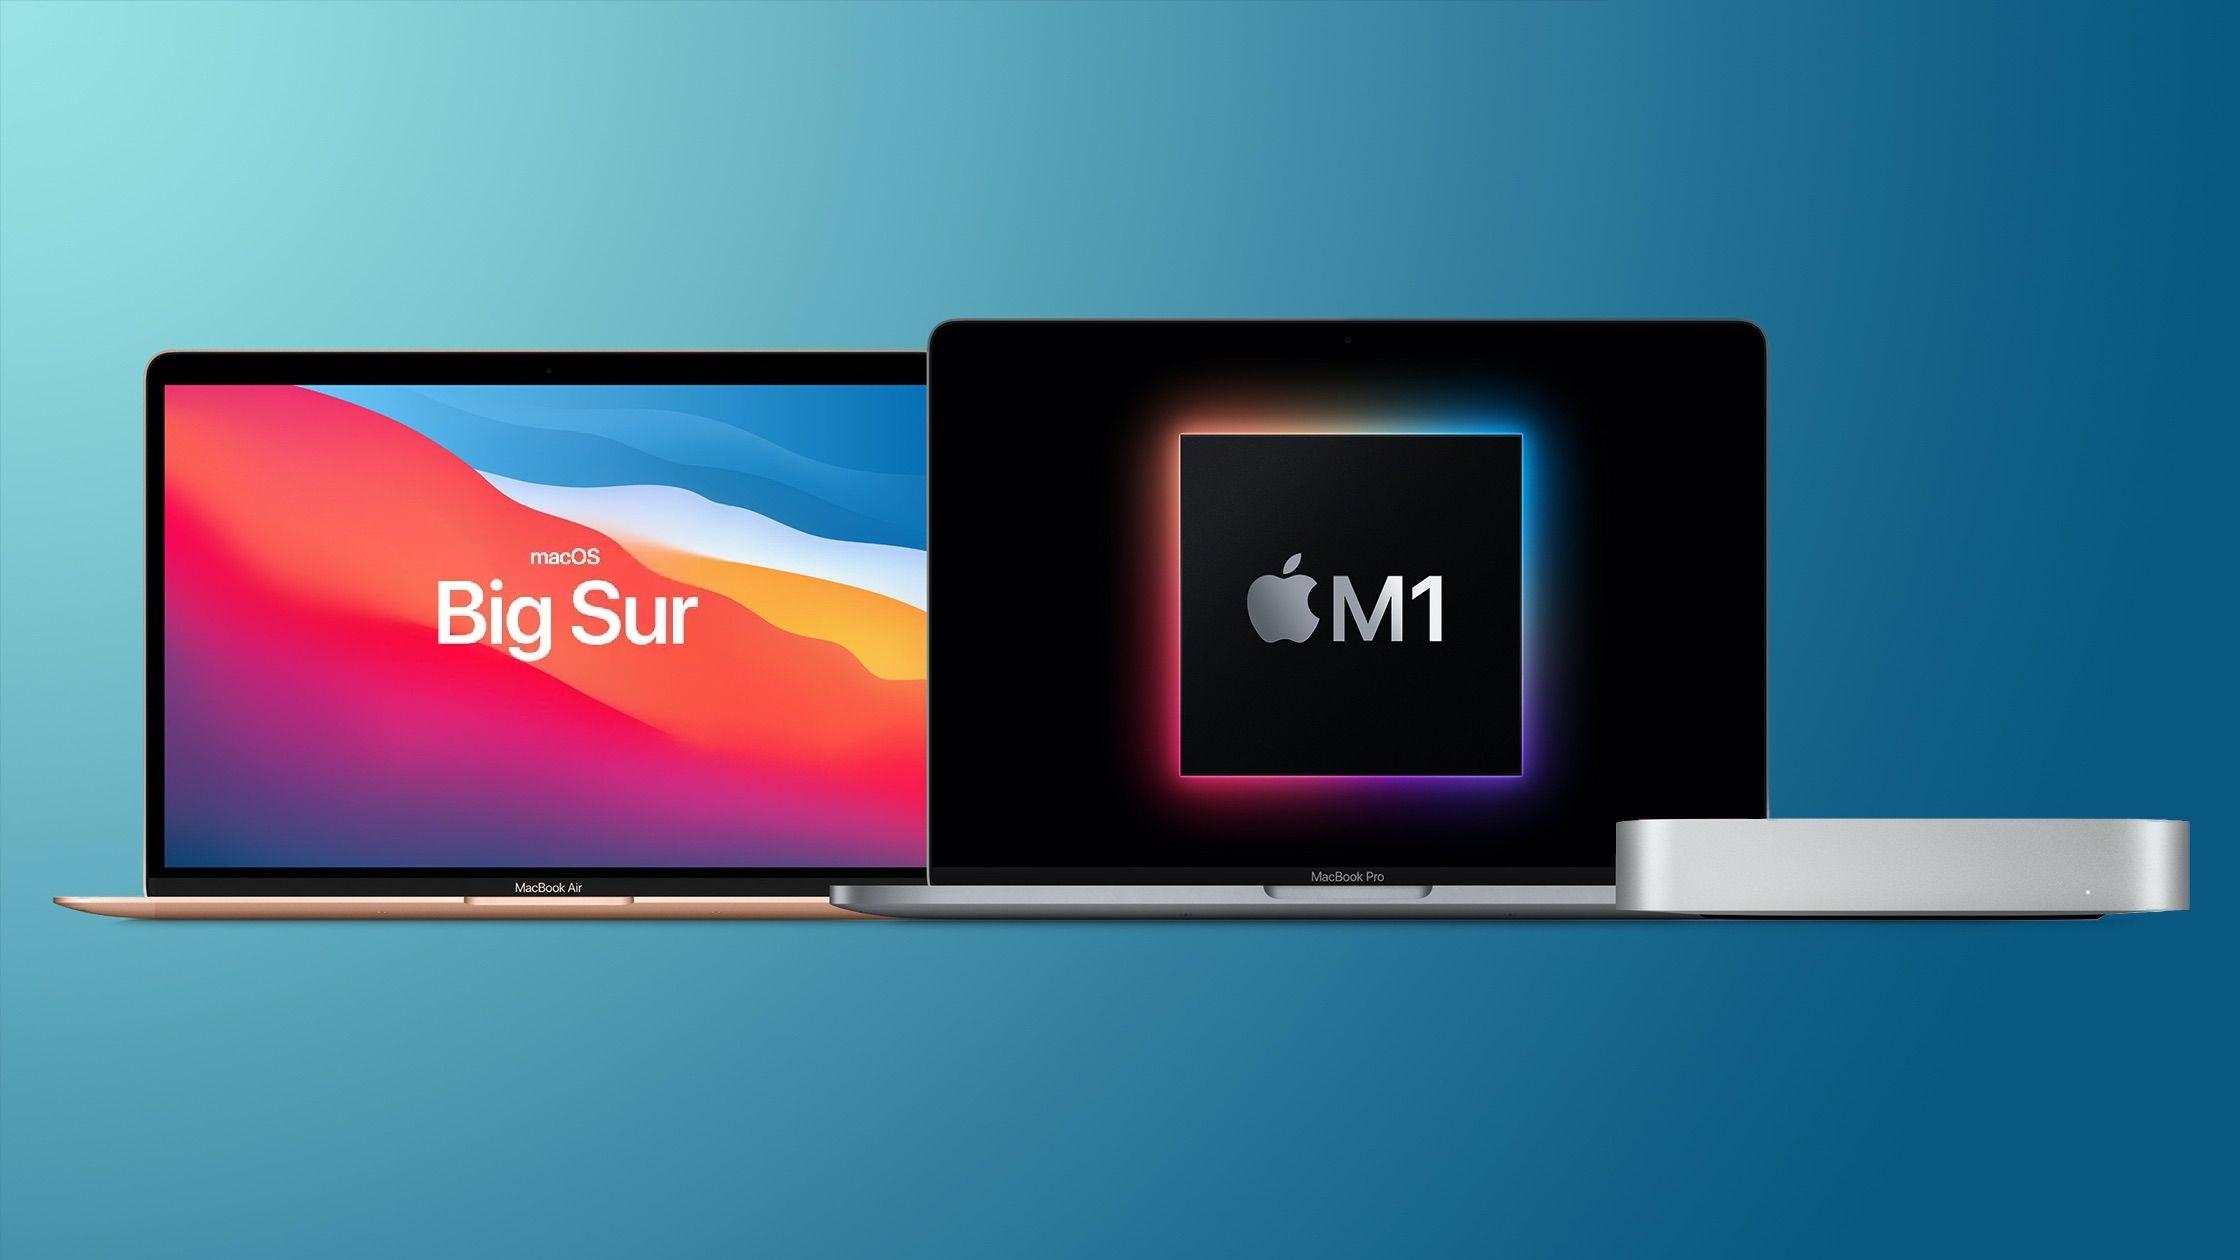 _MAC__Apple_M1chip_and_Big_Sur.jpg